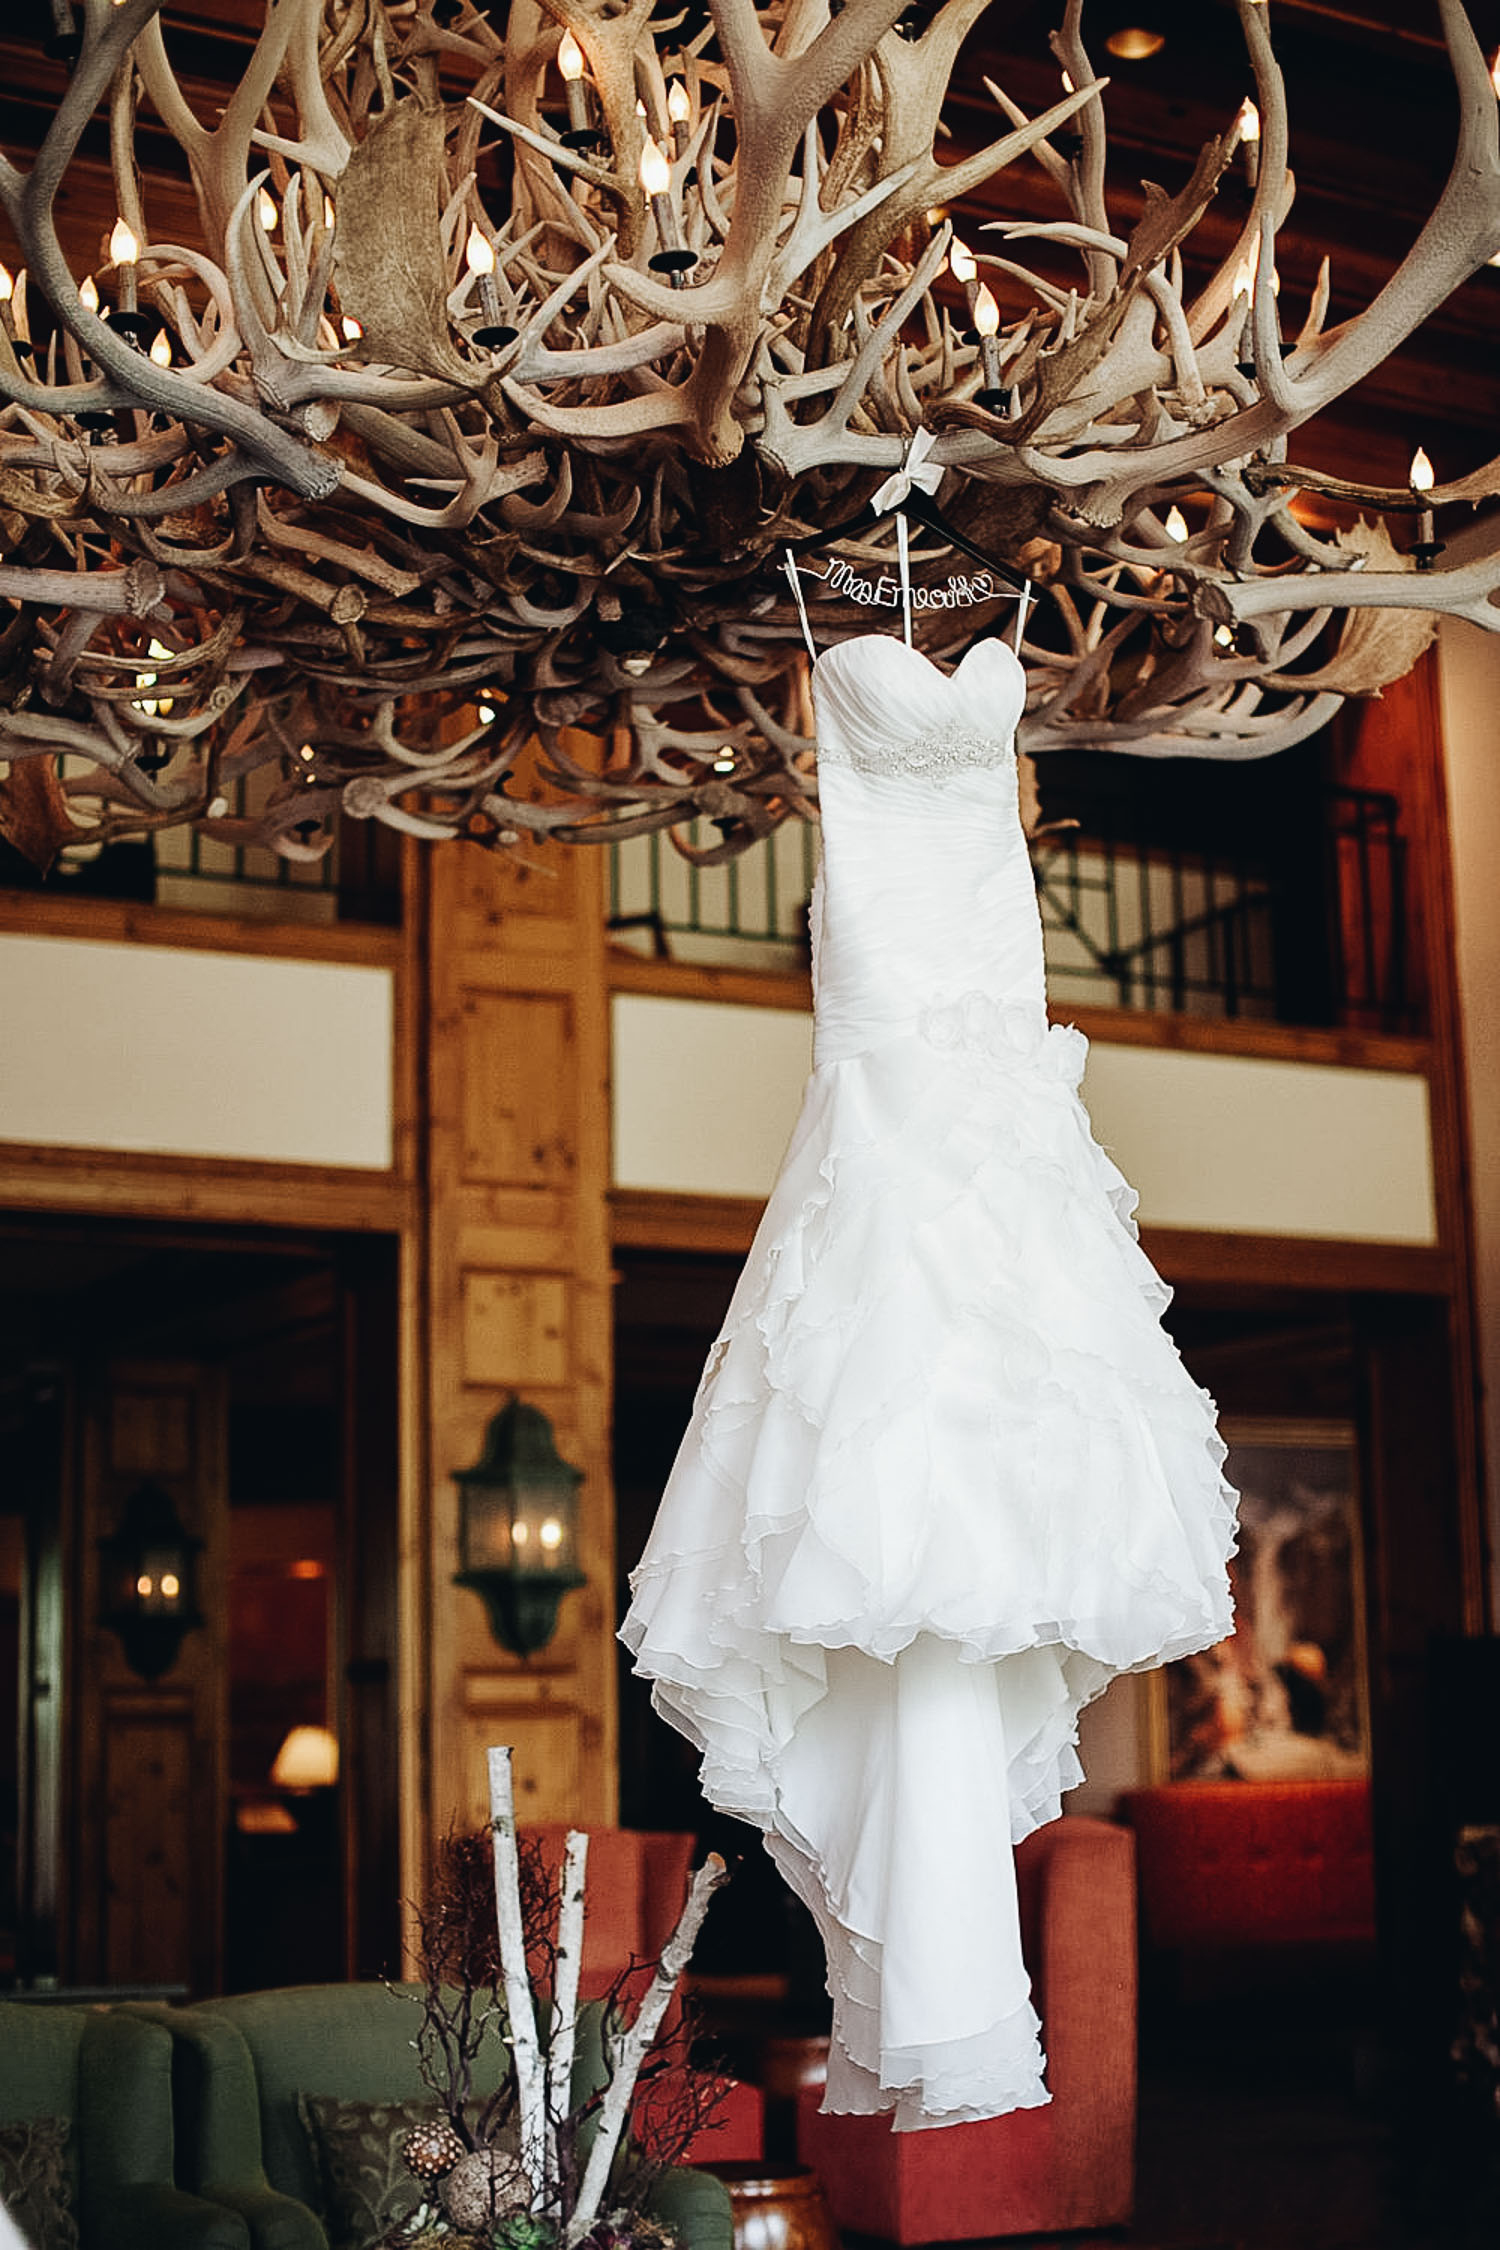 JMPHOTOART-Wedding-Photographer-49.jpg